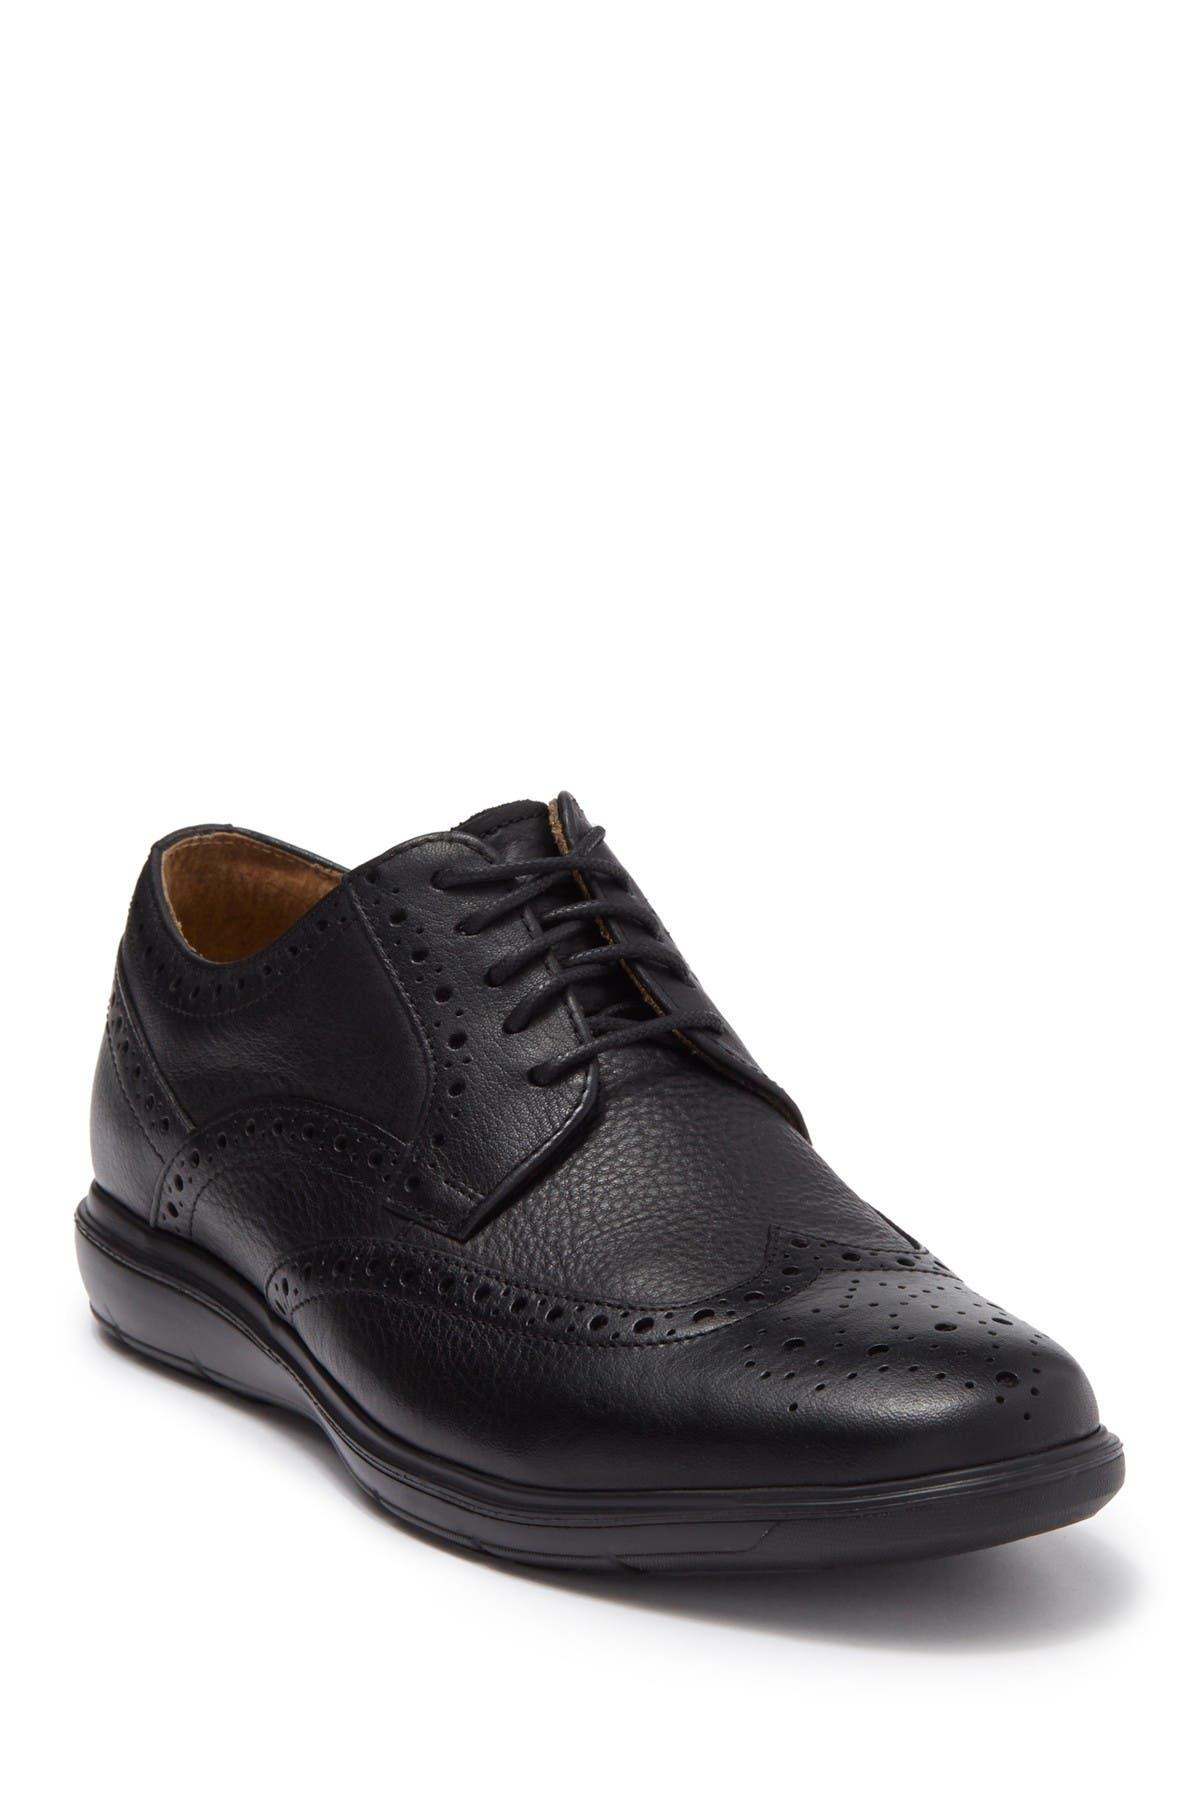 Indio Leather Wingtip Oxford